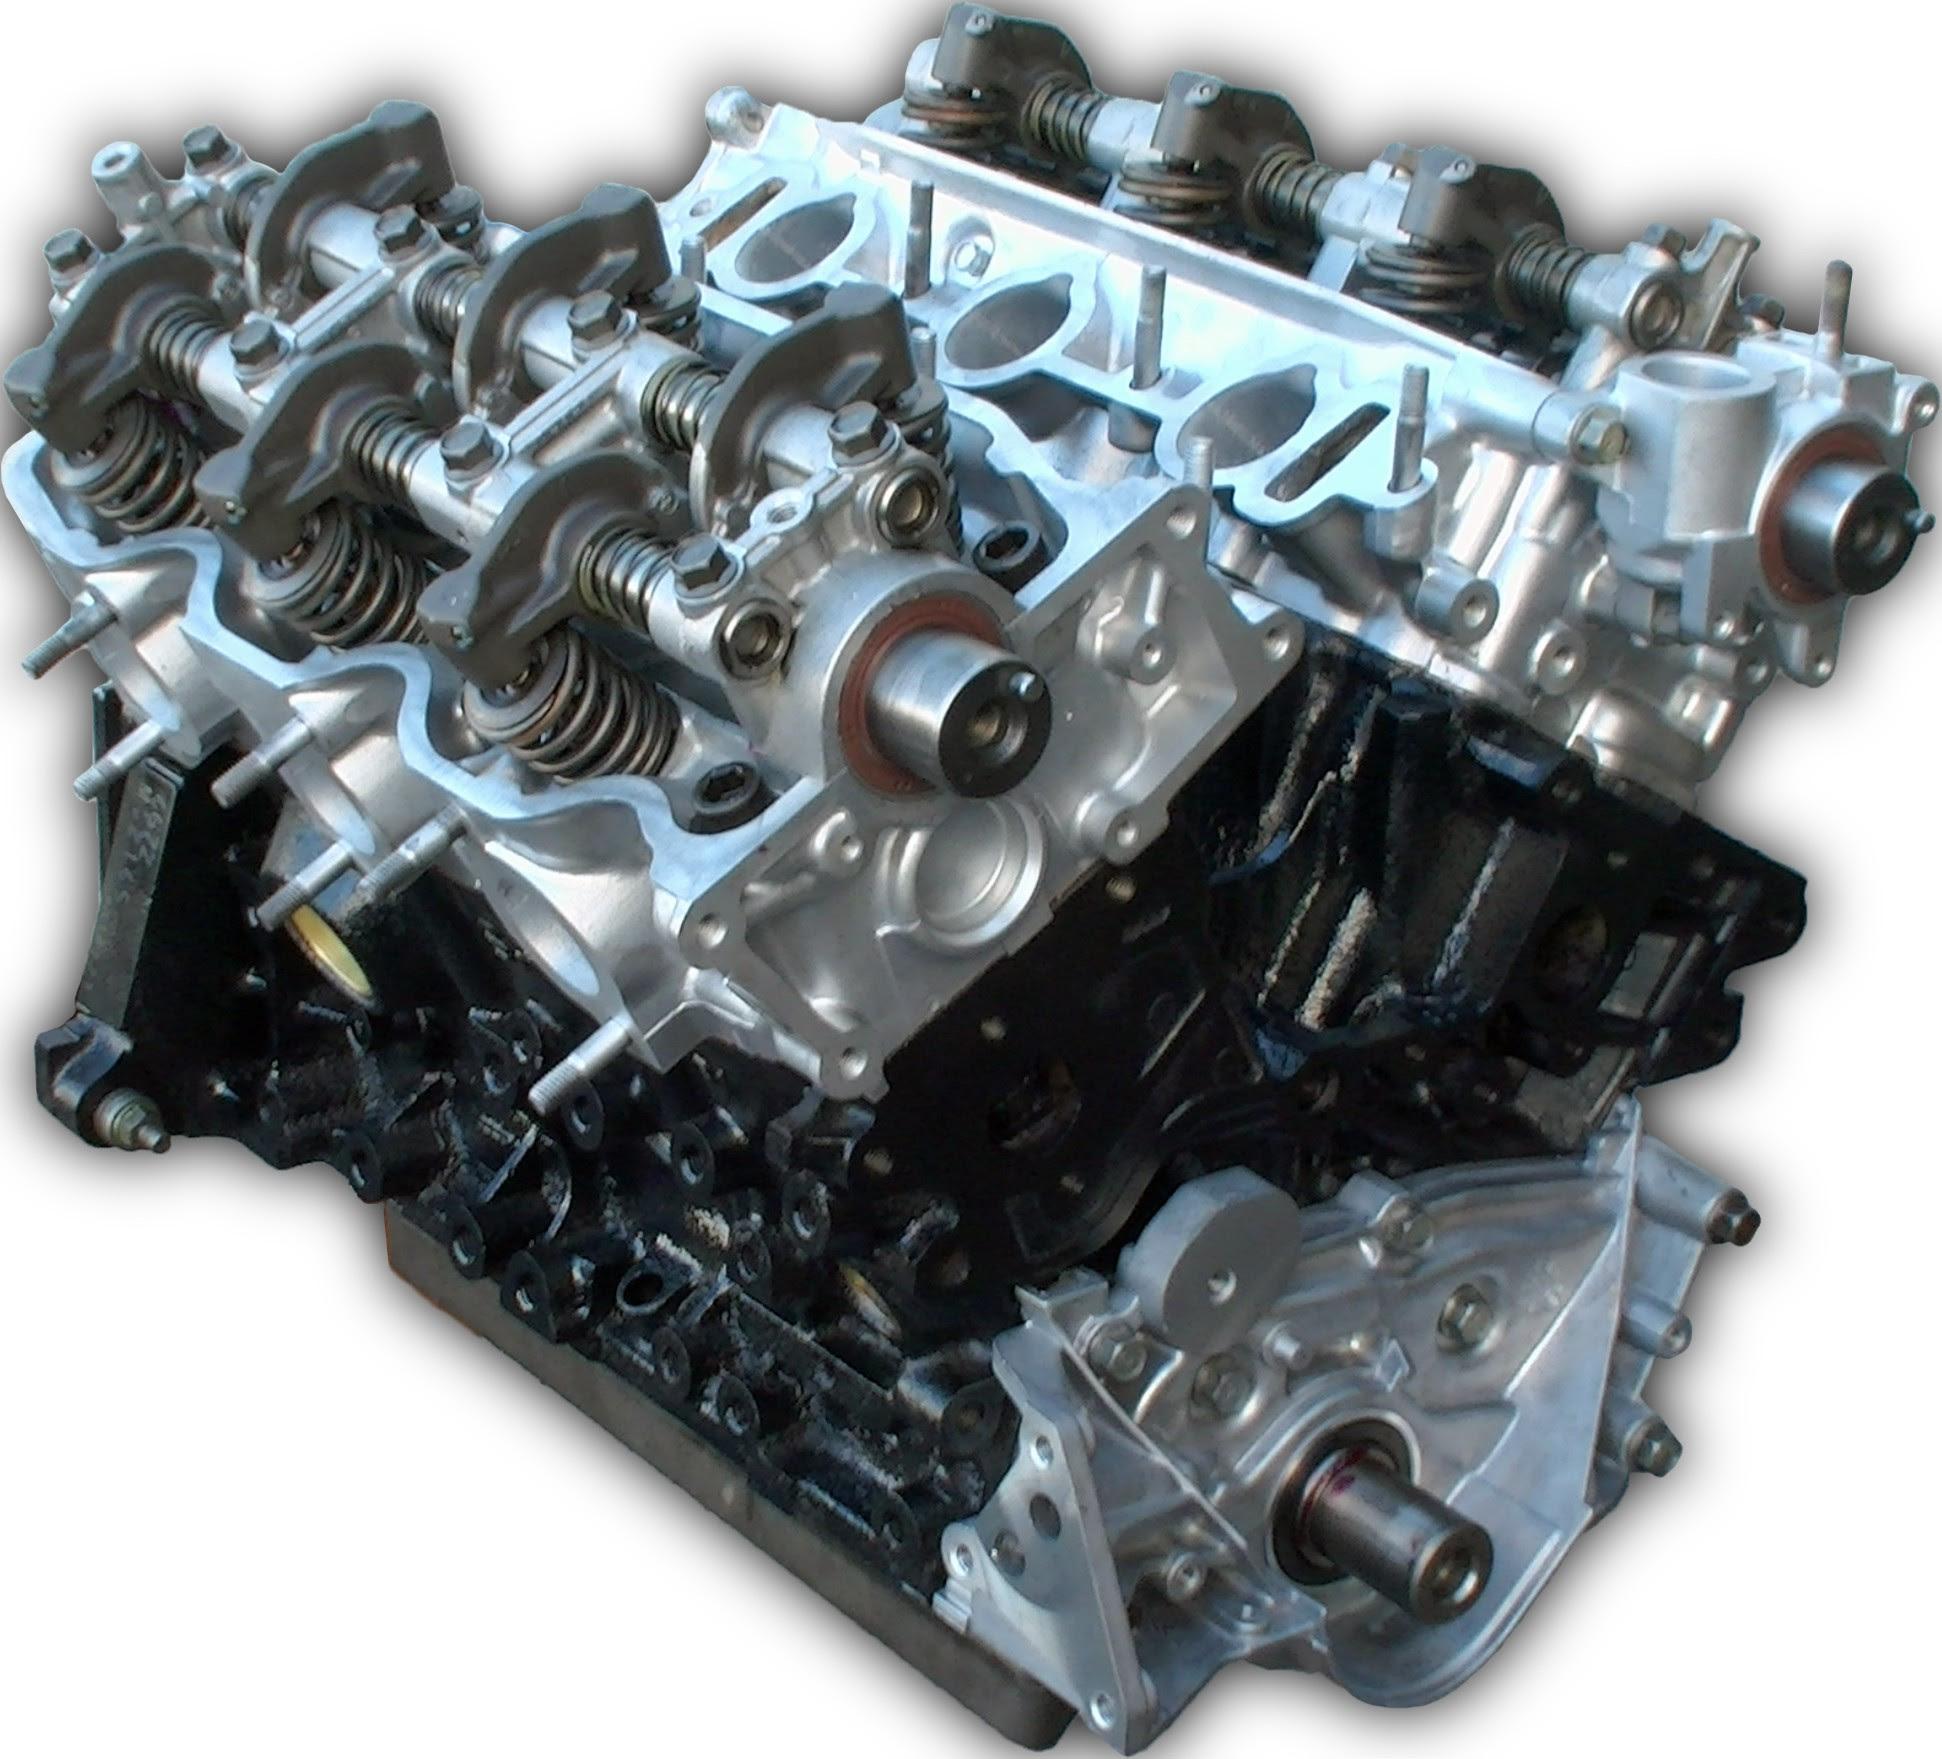 Diagram Mazda 3 0 V6 Engine Diagram Full Version Hd Quality Engine Diagram Learnbigdatabase Terrassement De Vita Fr